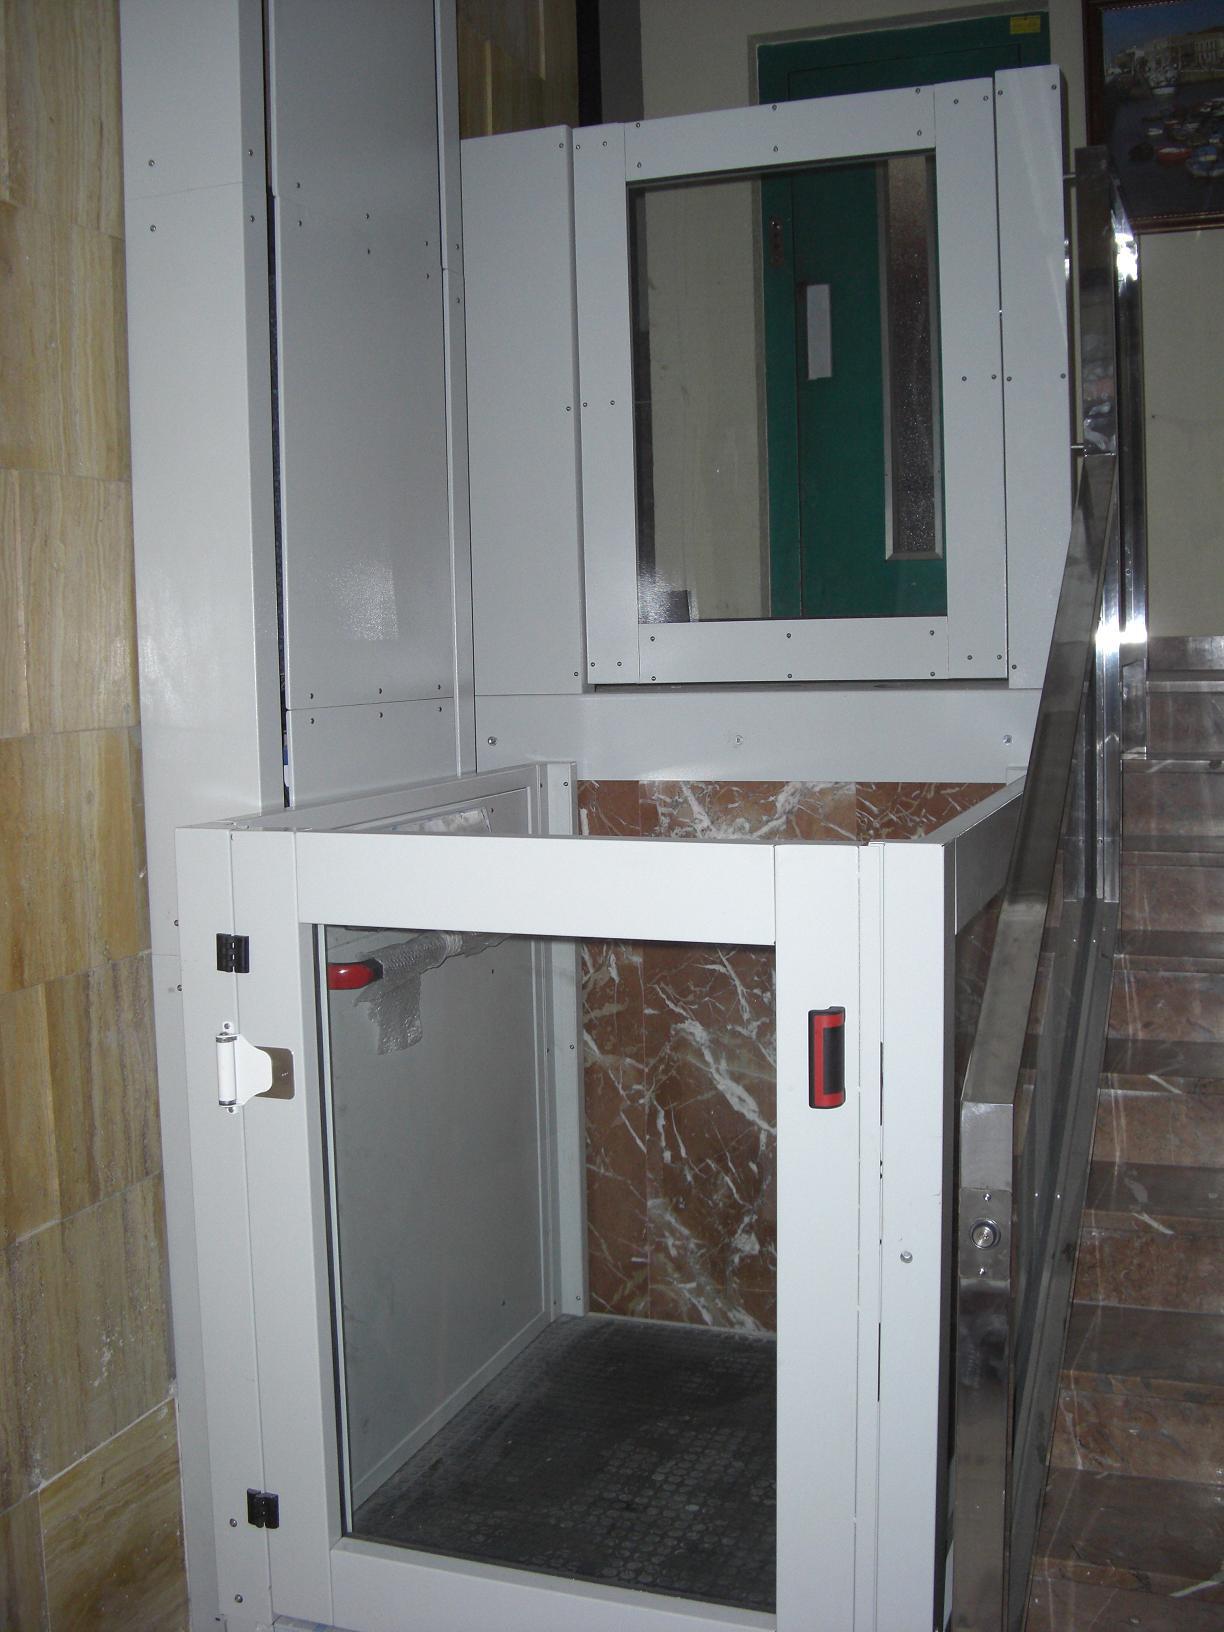 Plataforma vertical salvaescaleras eleser for Salvaescaleras vertical